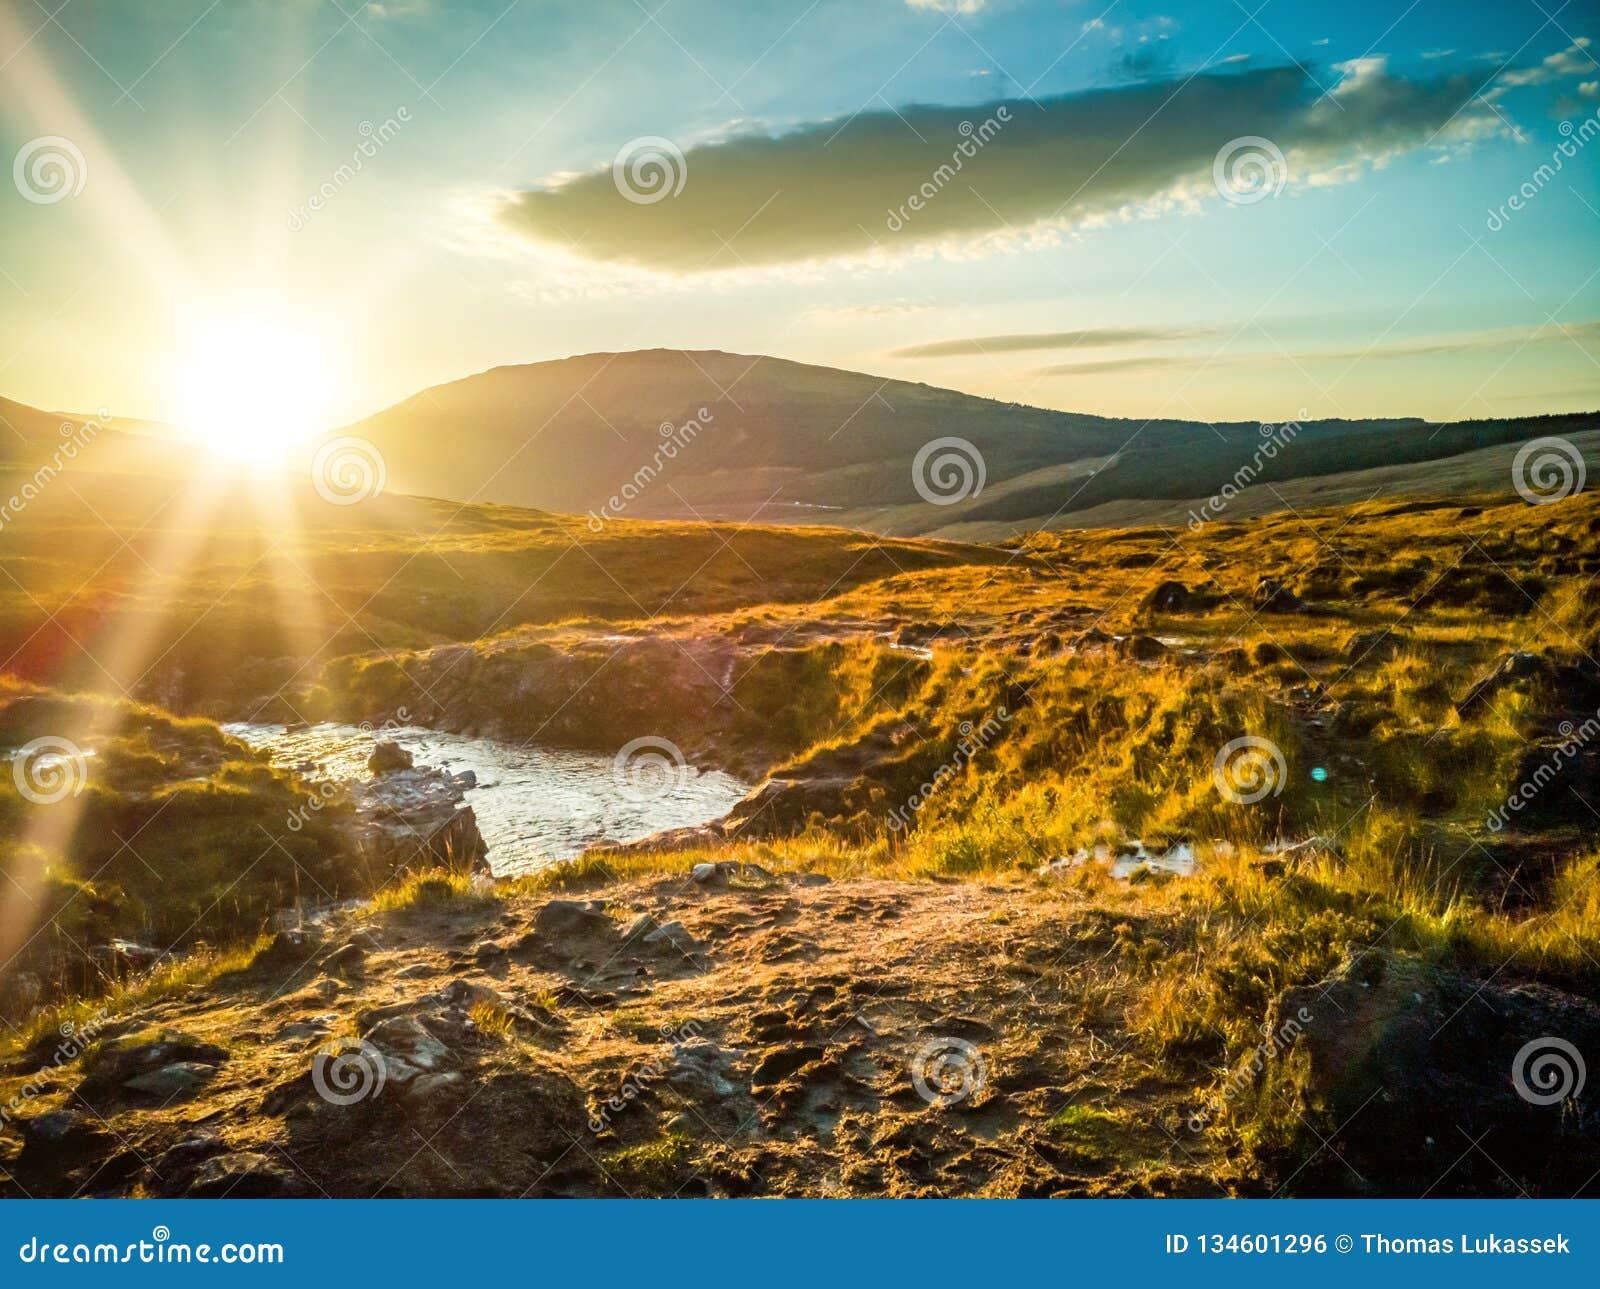 Sunset at the Fairy Pools in autumn, Glen Brittle, Skye, Scotland